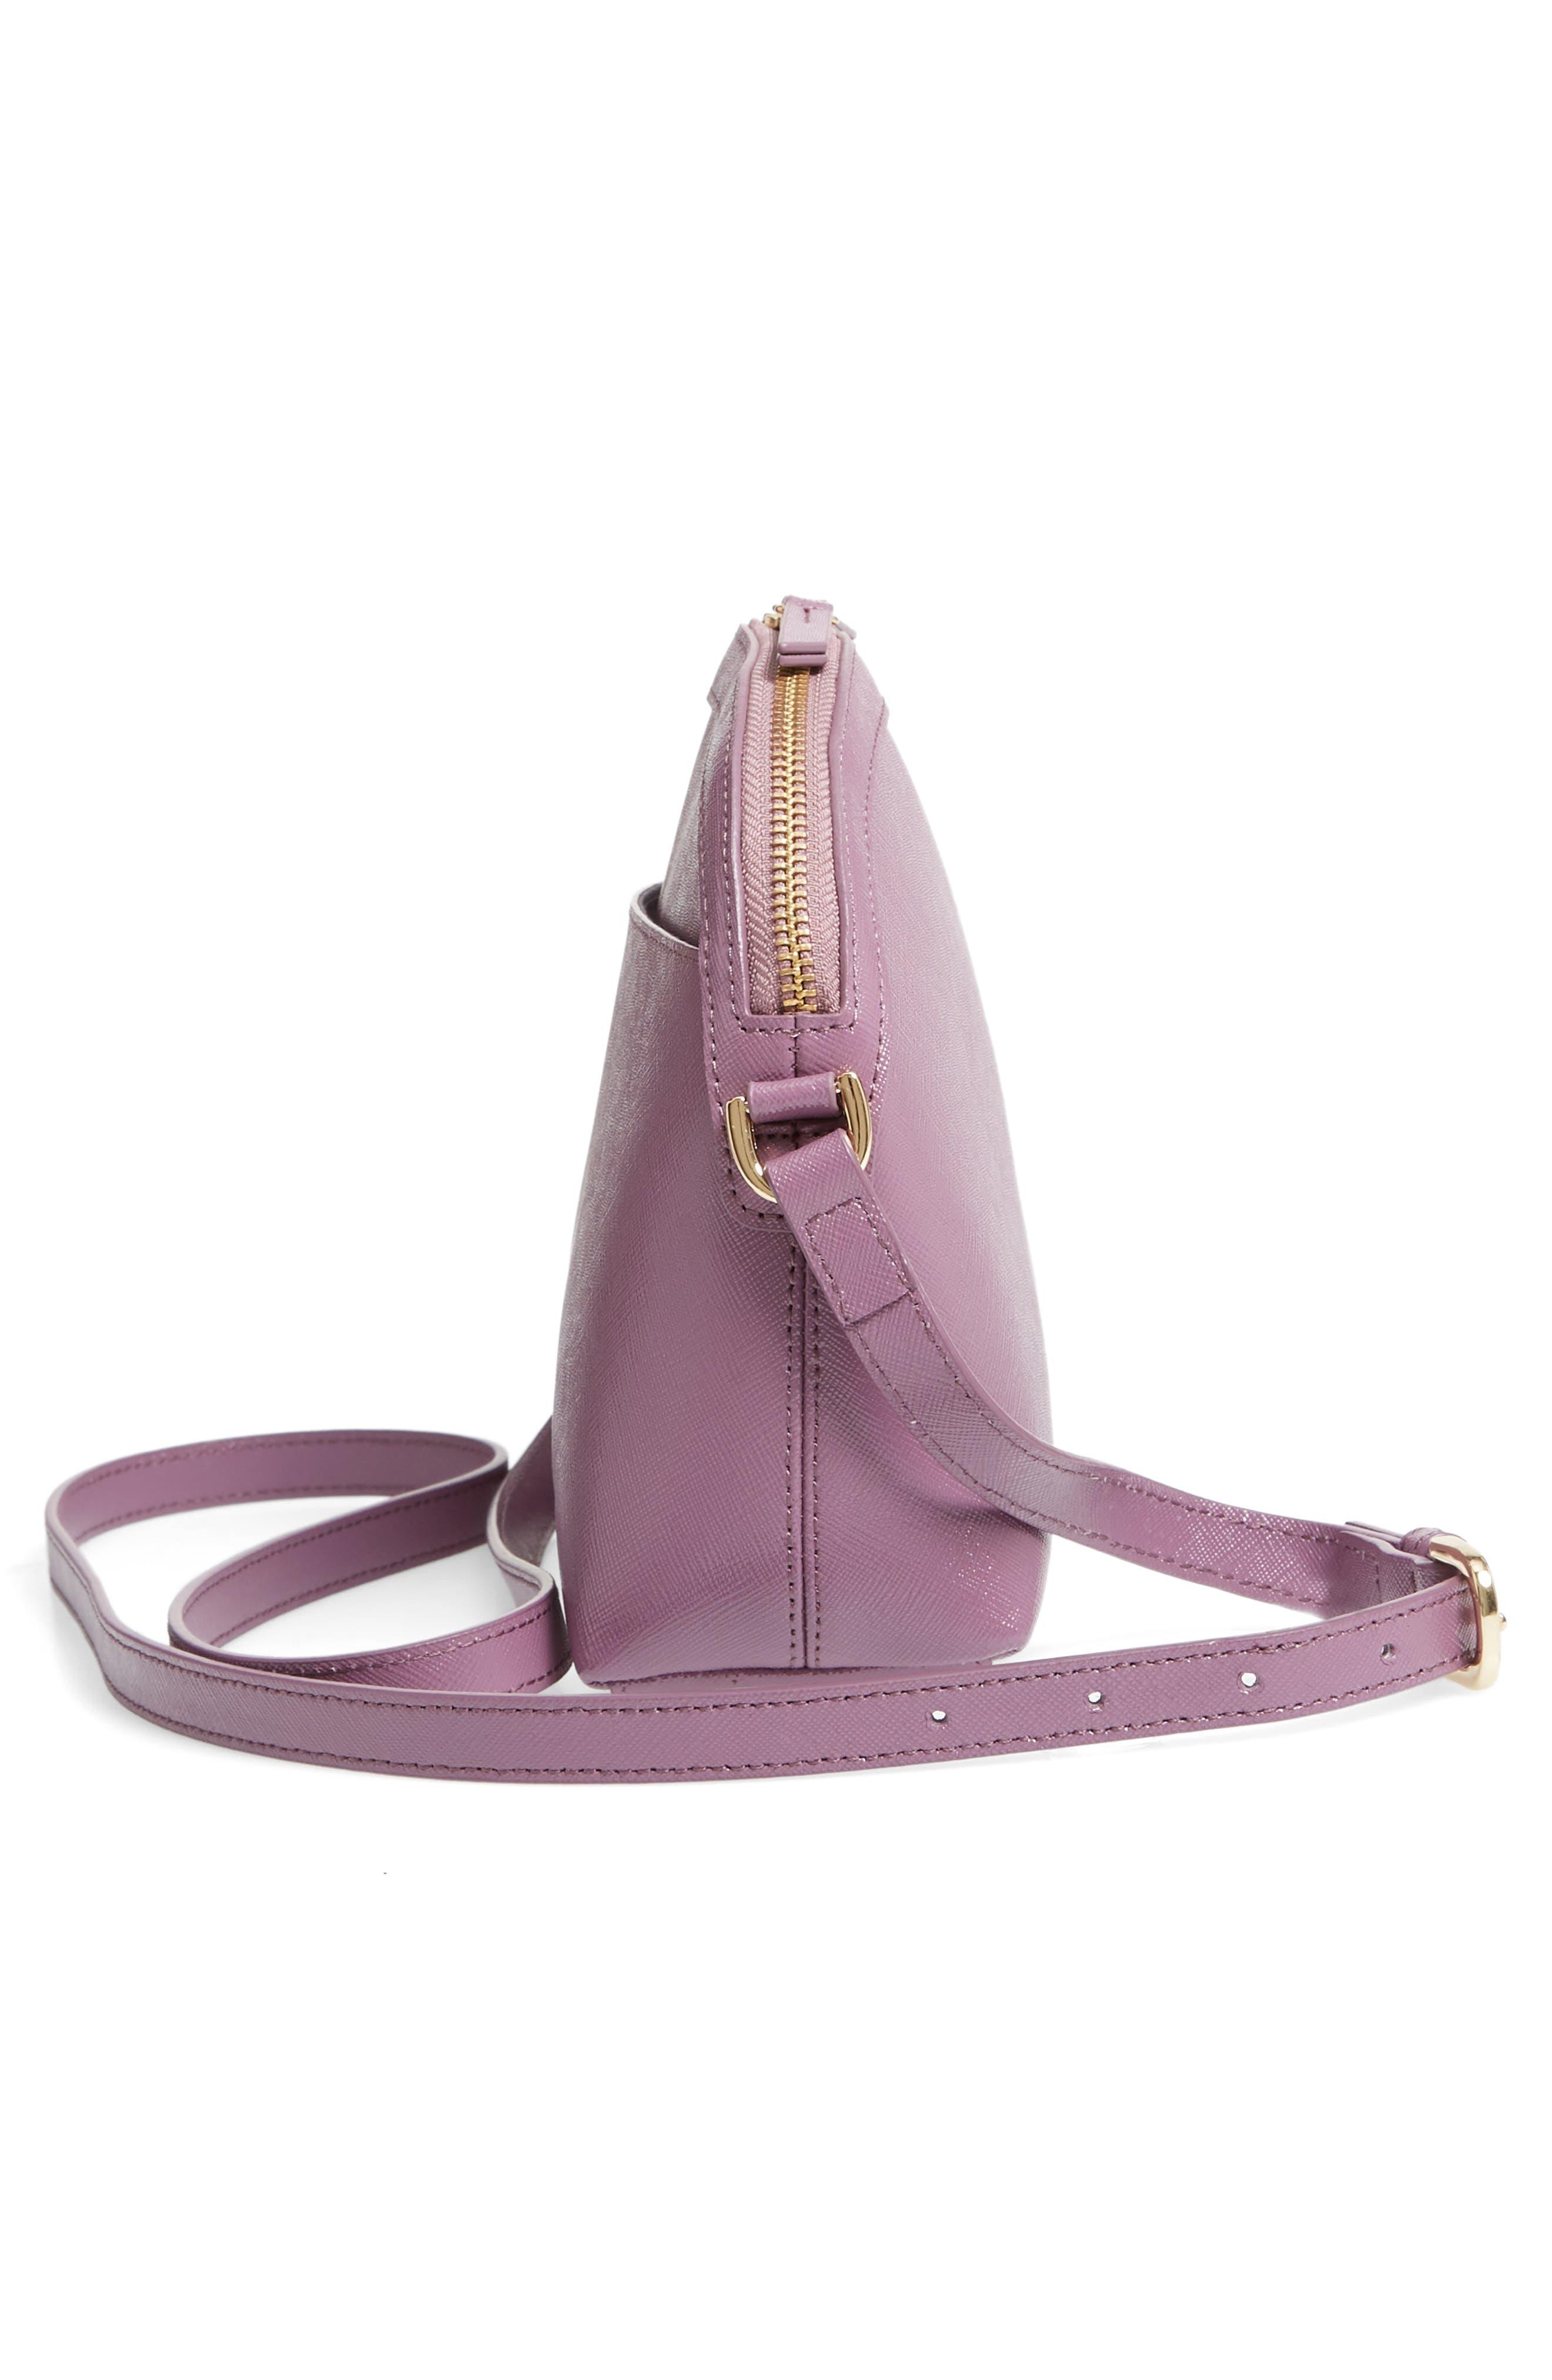 Isobel Half Moon Leather Crossbody Bag,                             Alternate thumbnail 5, color,                             PURPLE BETTA